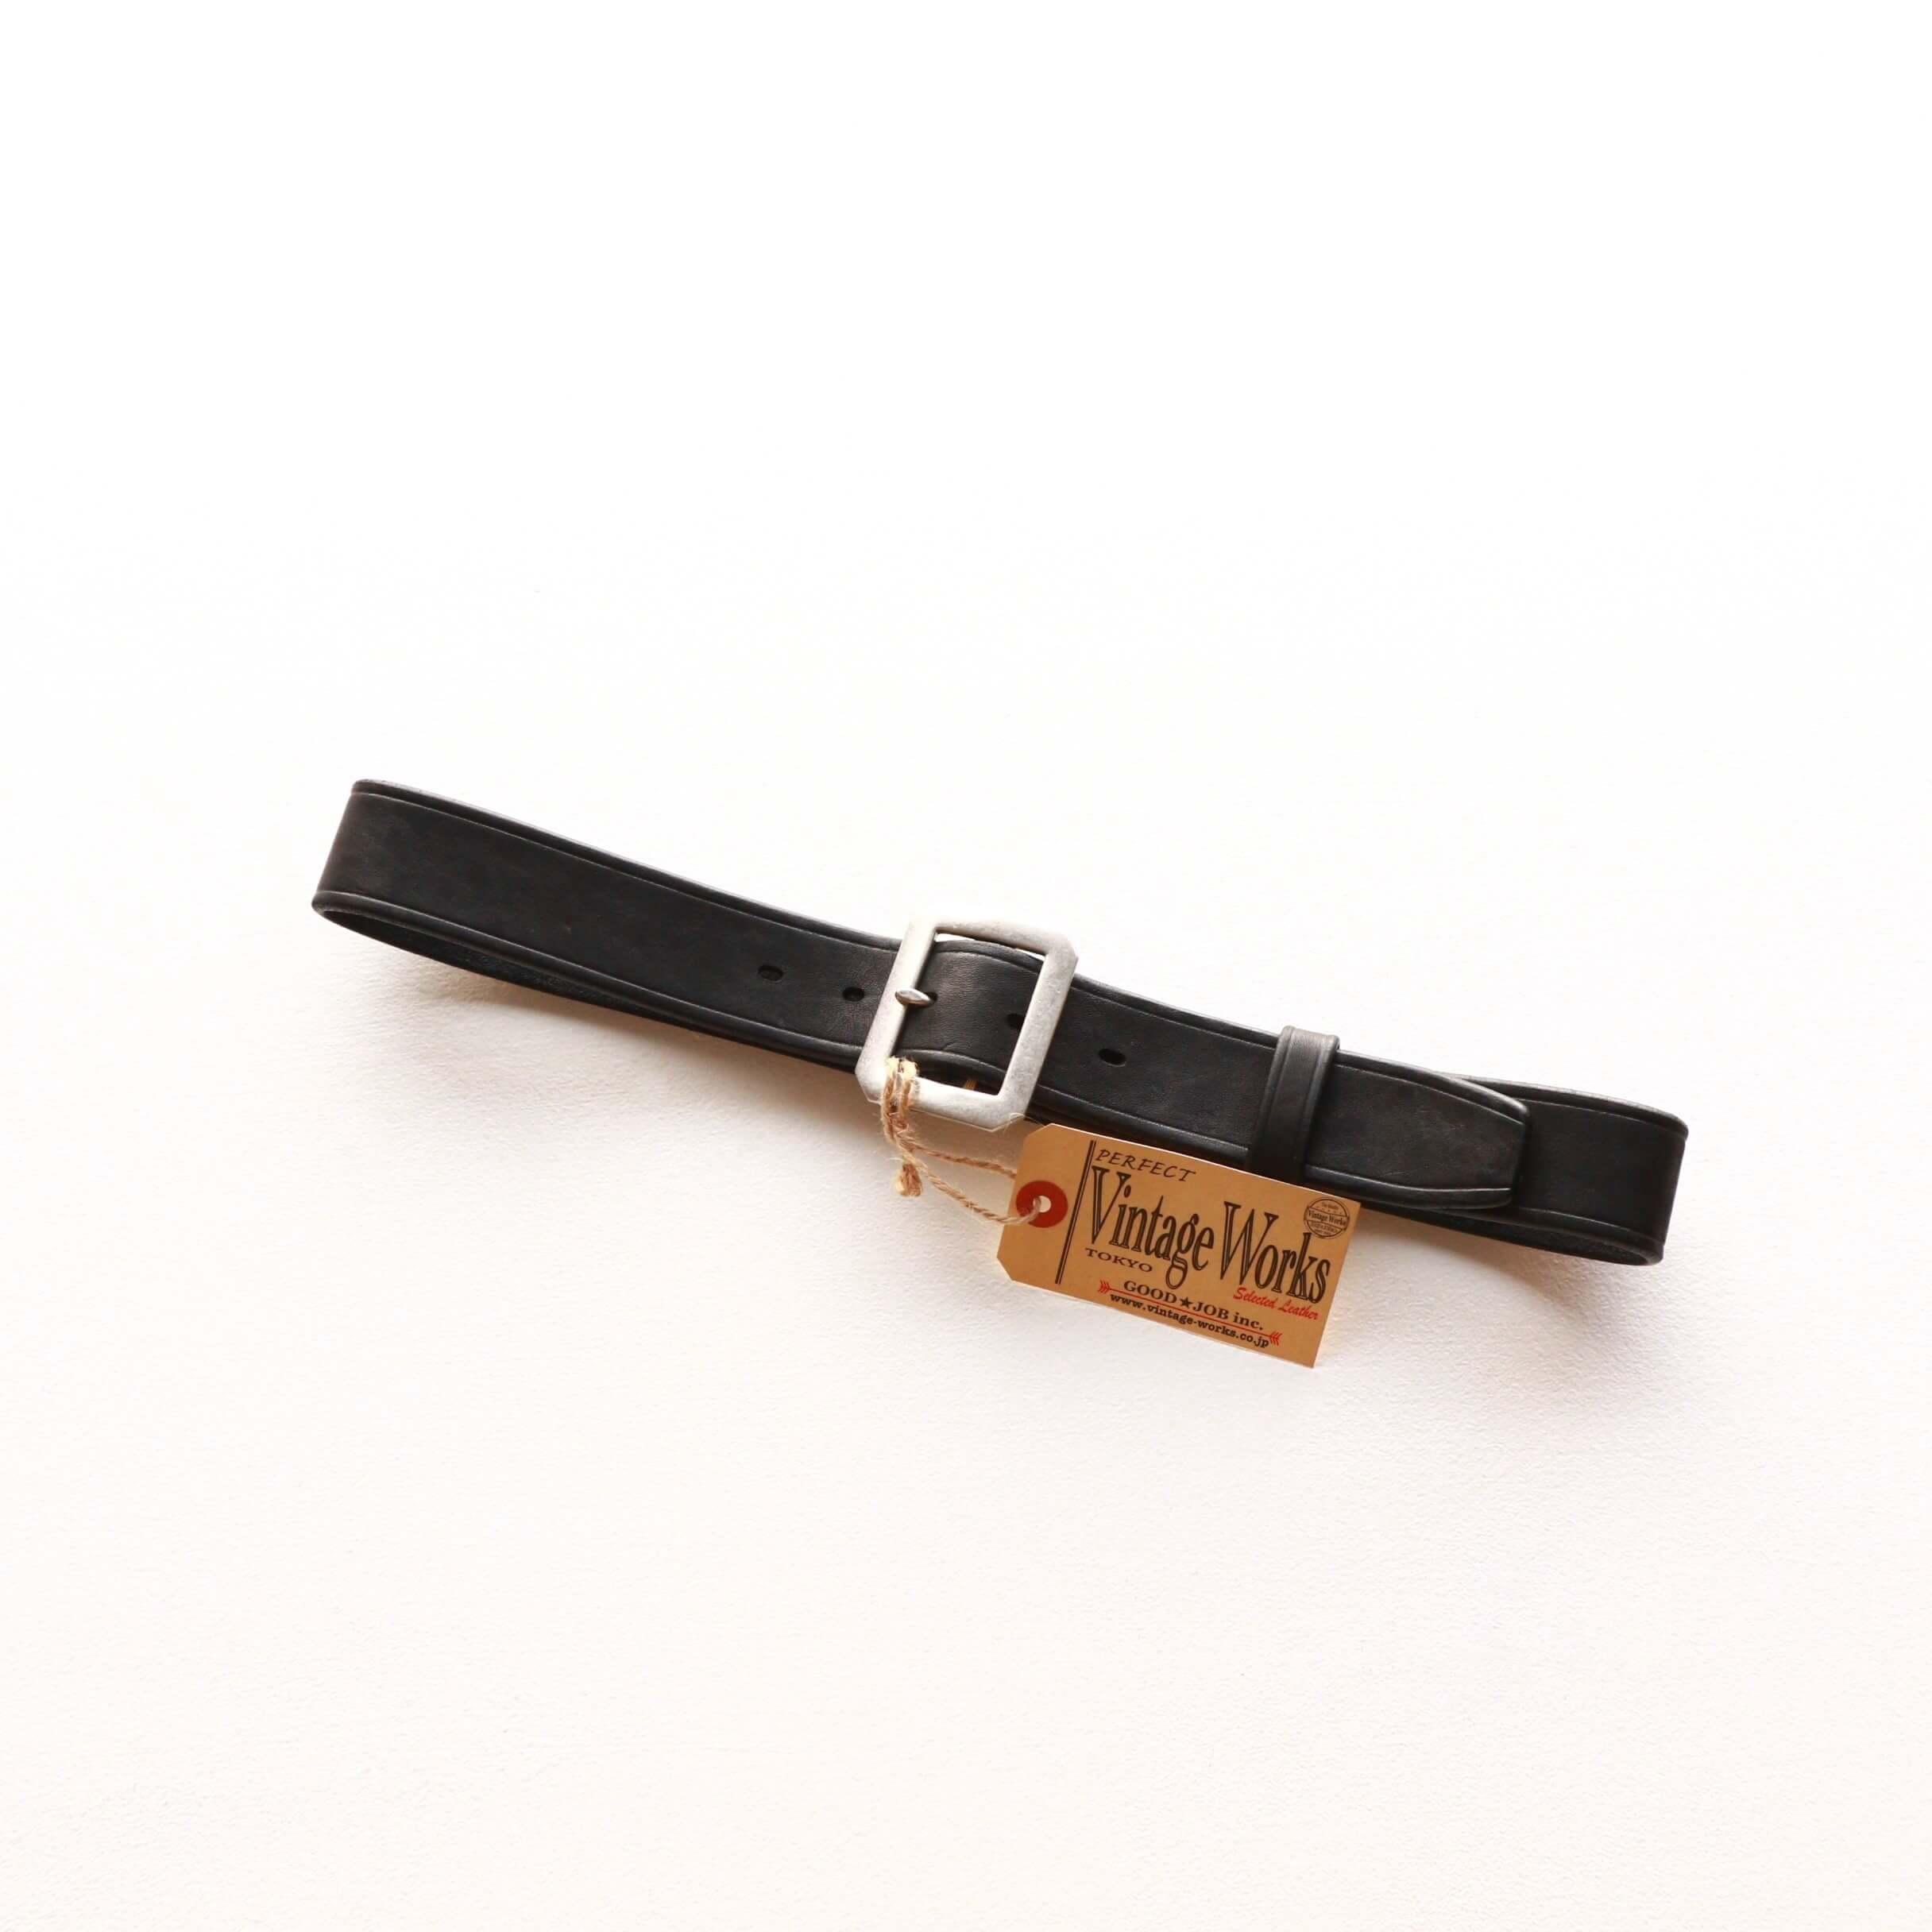 Vintage Works ヴィンテージワークス Leather belt 5Hole レザーベルト 5ホール DH5725